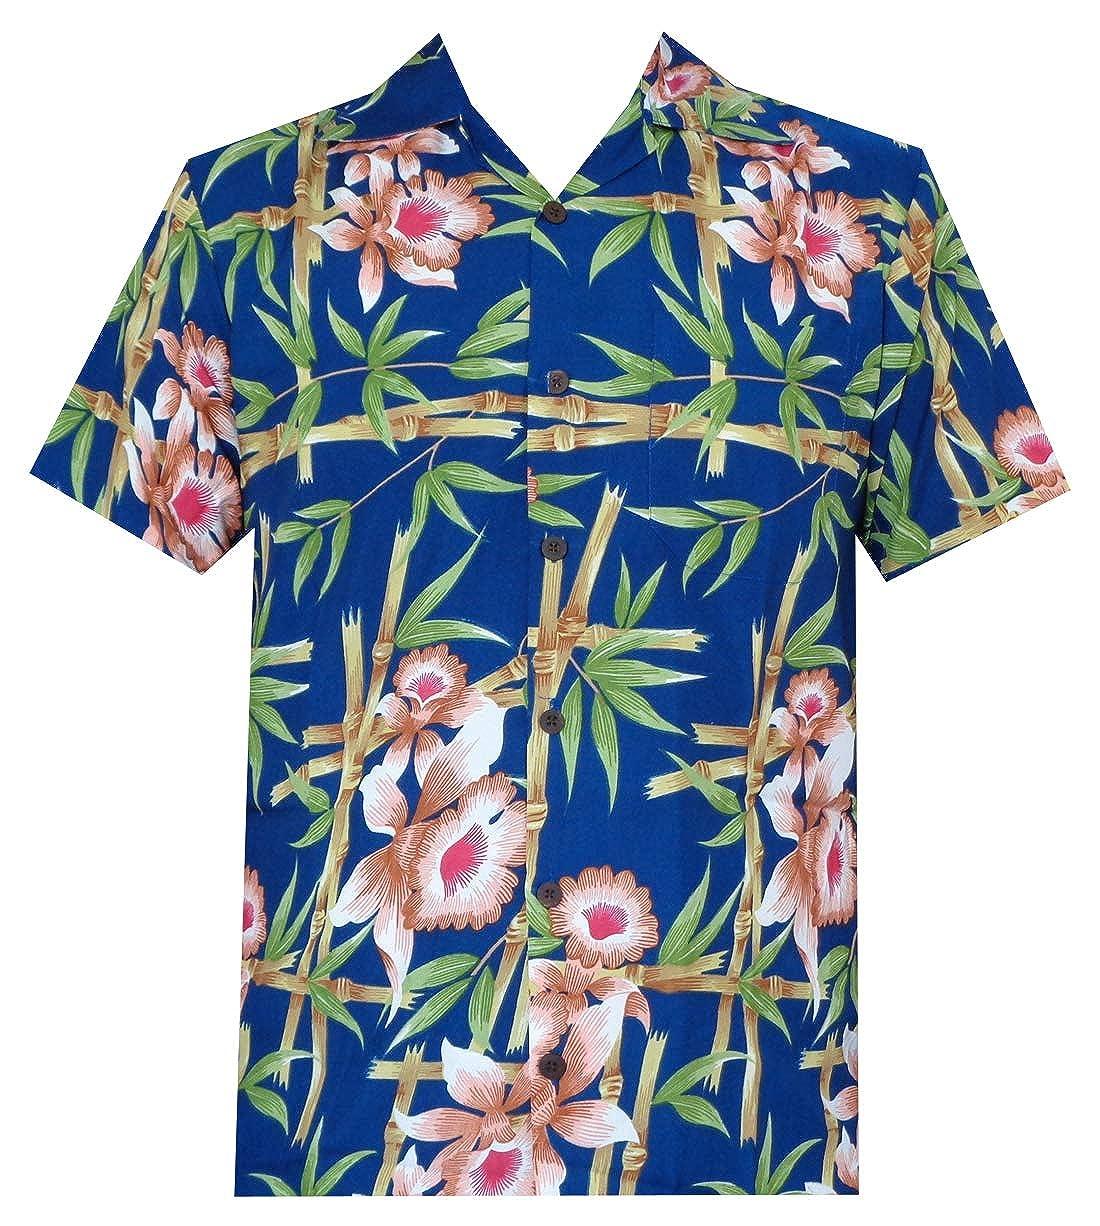 Flamingo Leaf Print Beach Aloha Party Casual Mens Shirt Hawaiian Shirt 37 Mens